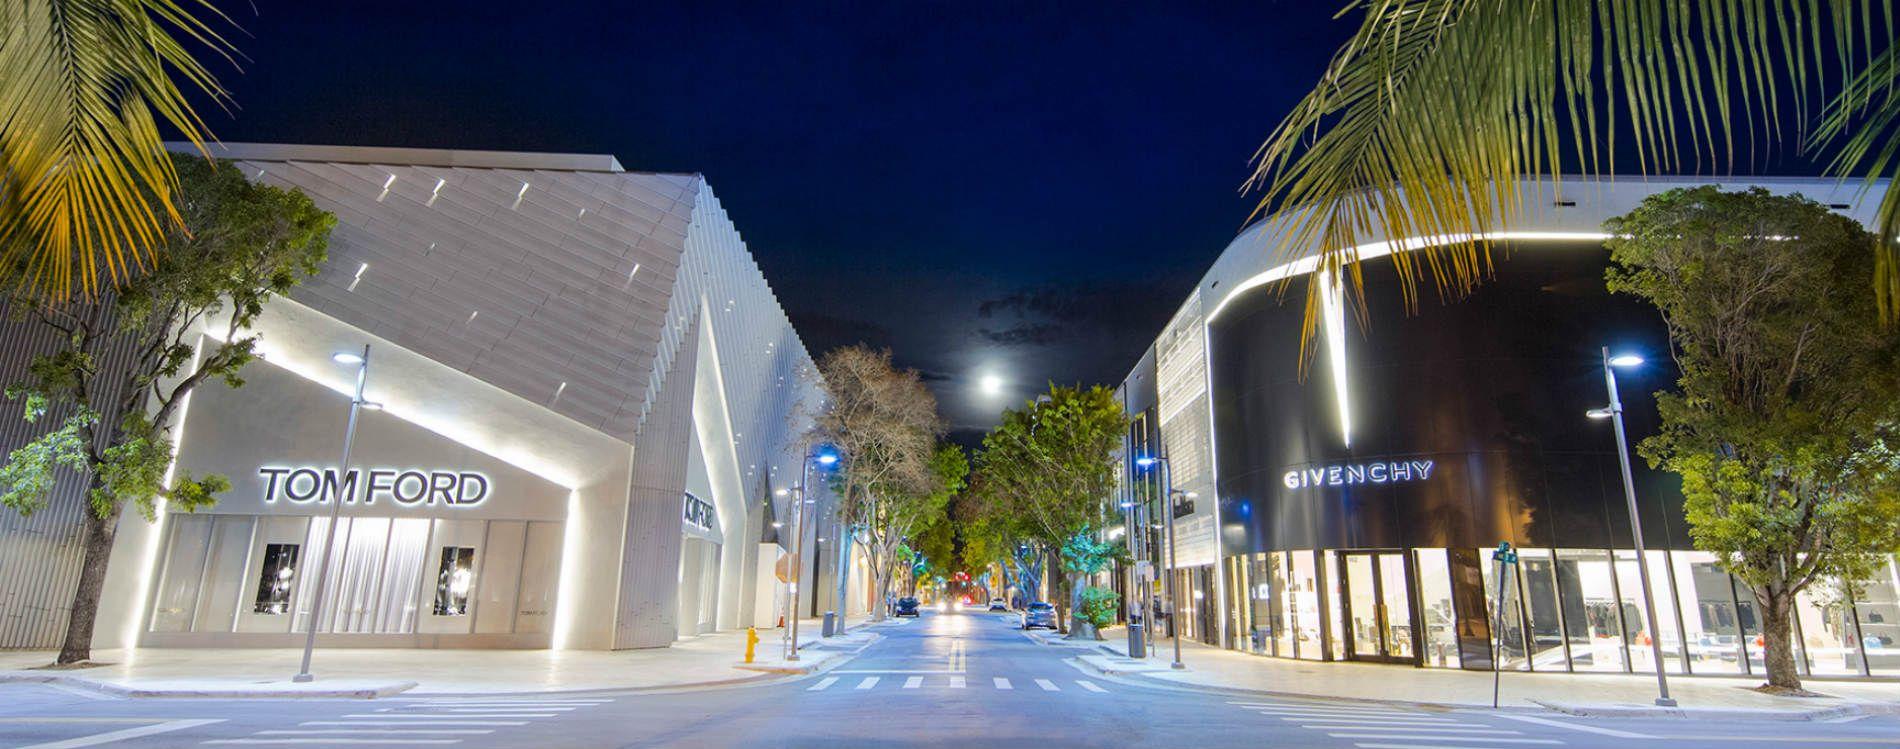 Givenchy Tom Ford Miami desain distrik